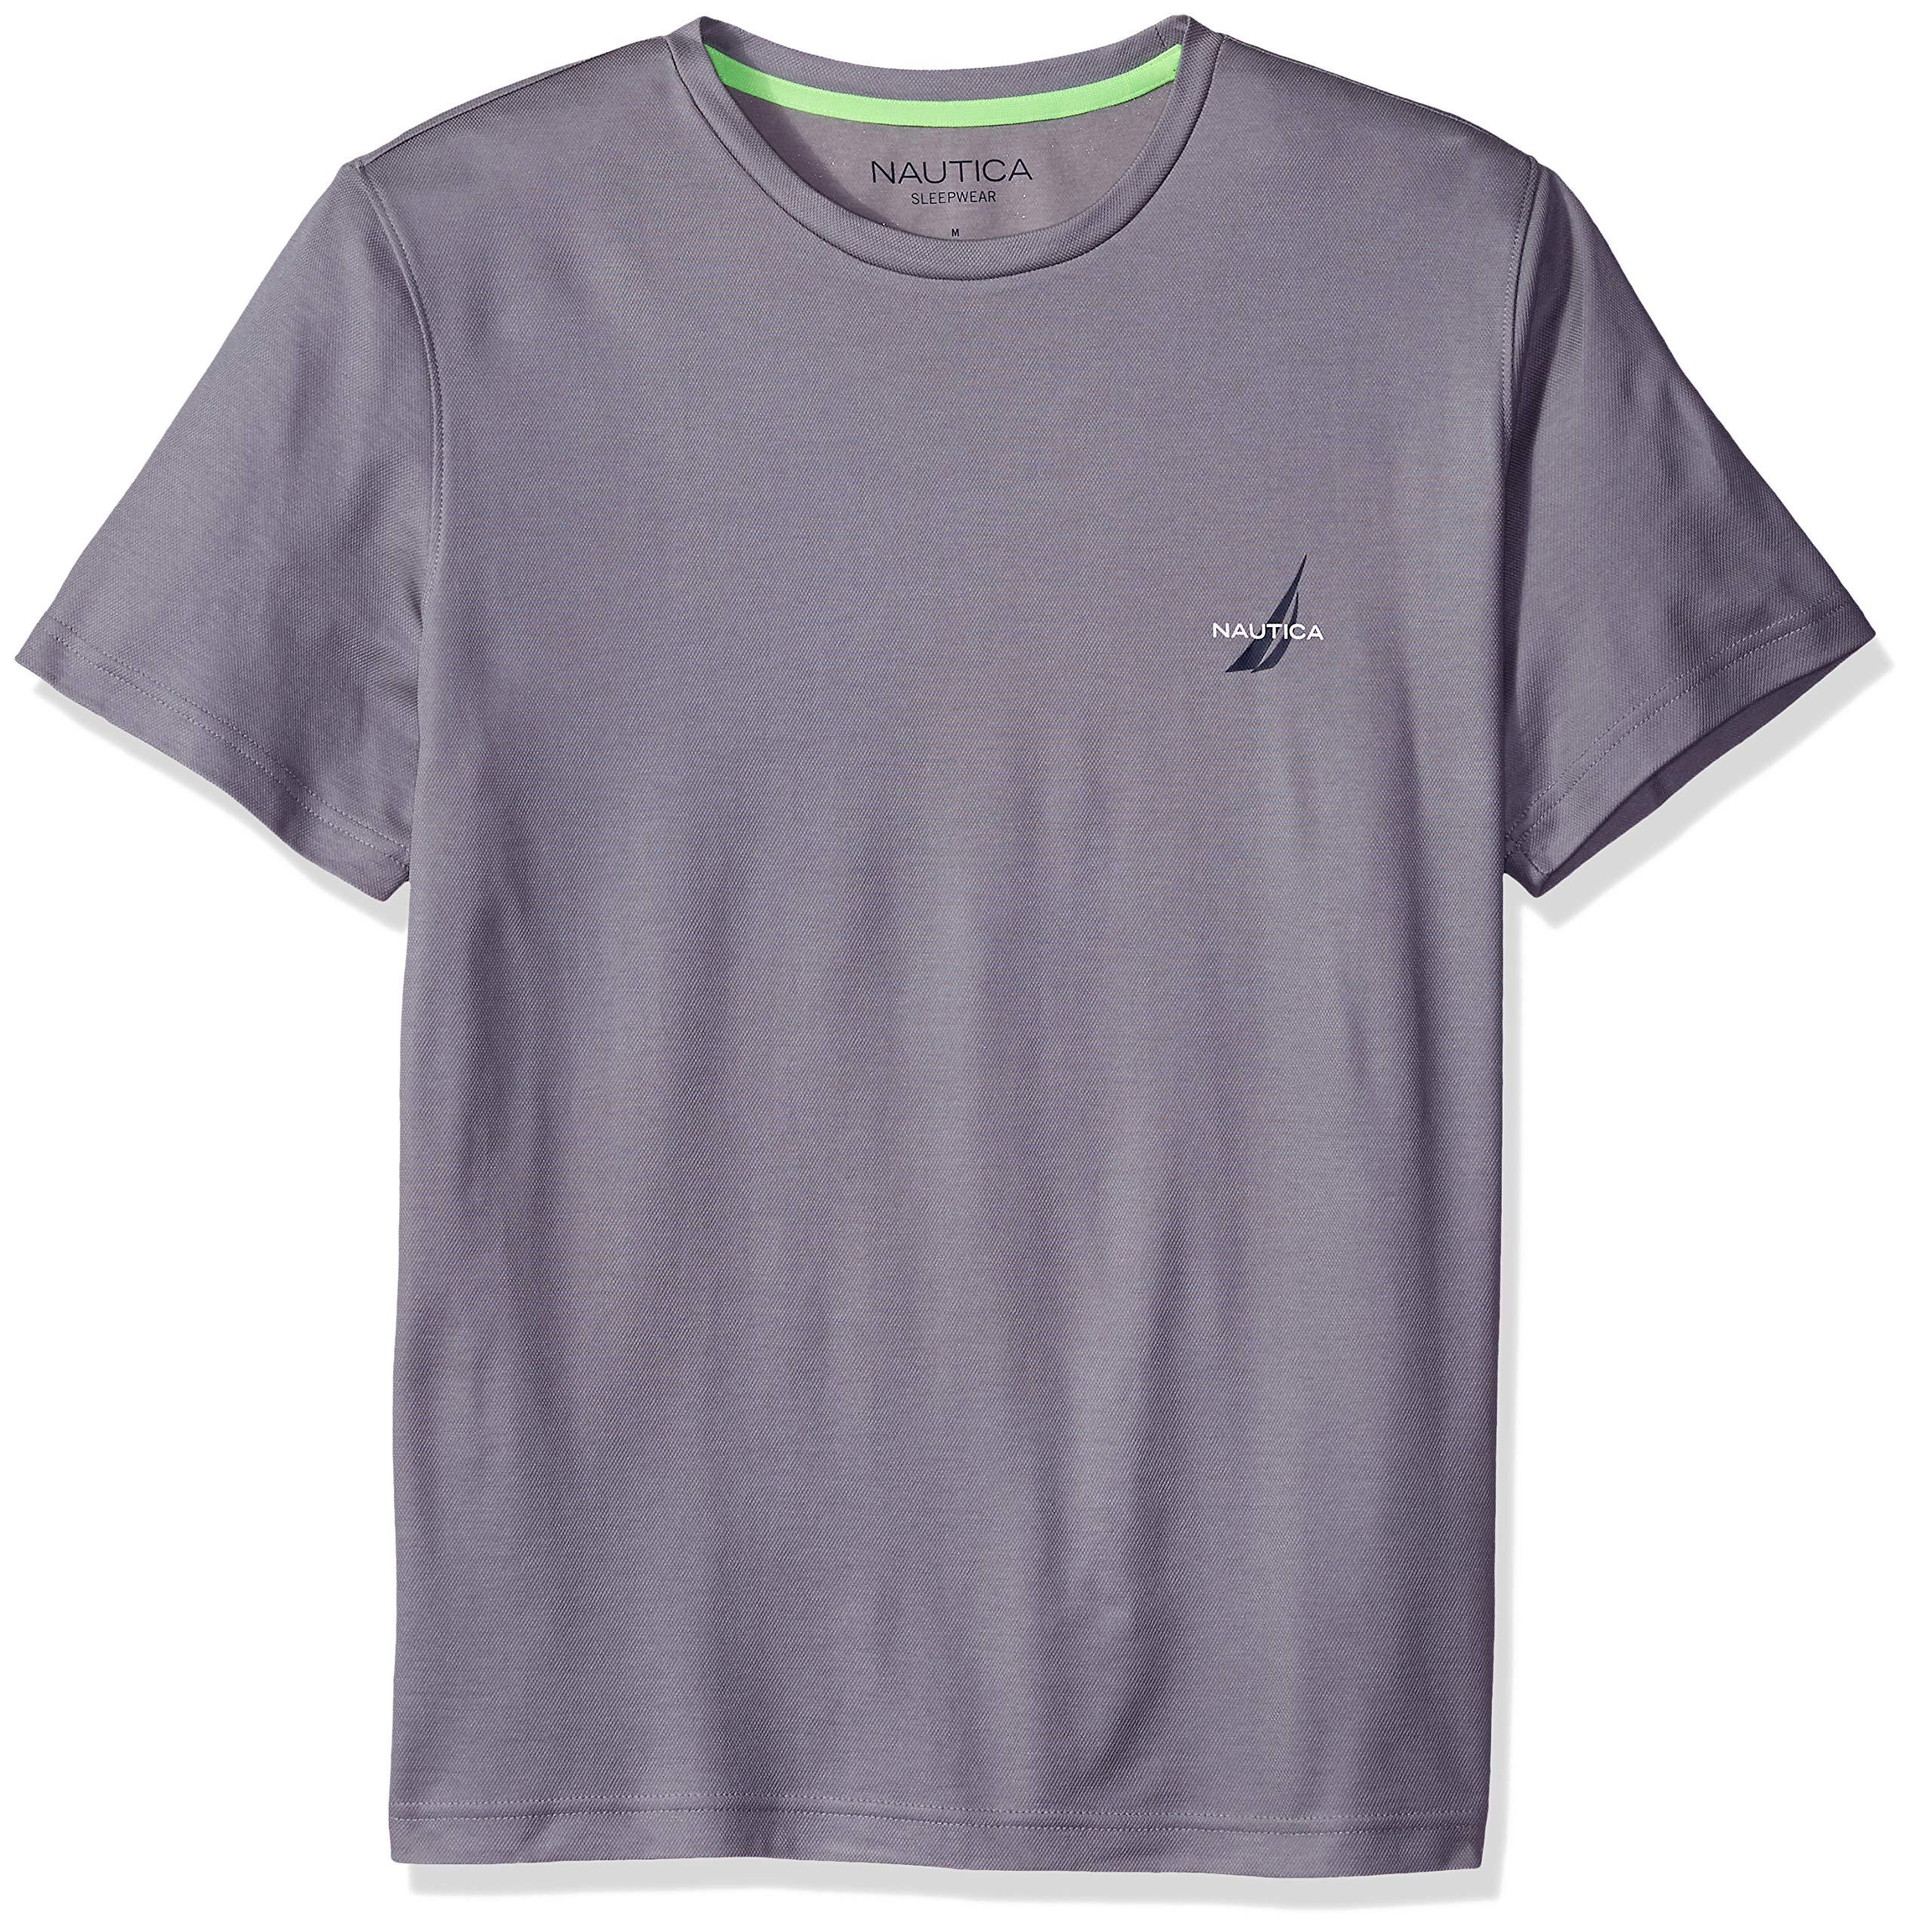 Nautica Menソフトシーブリーズハイパフォーマンスニットパール半袖Tシャツ